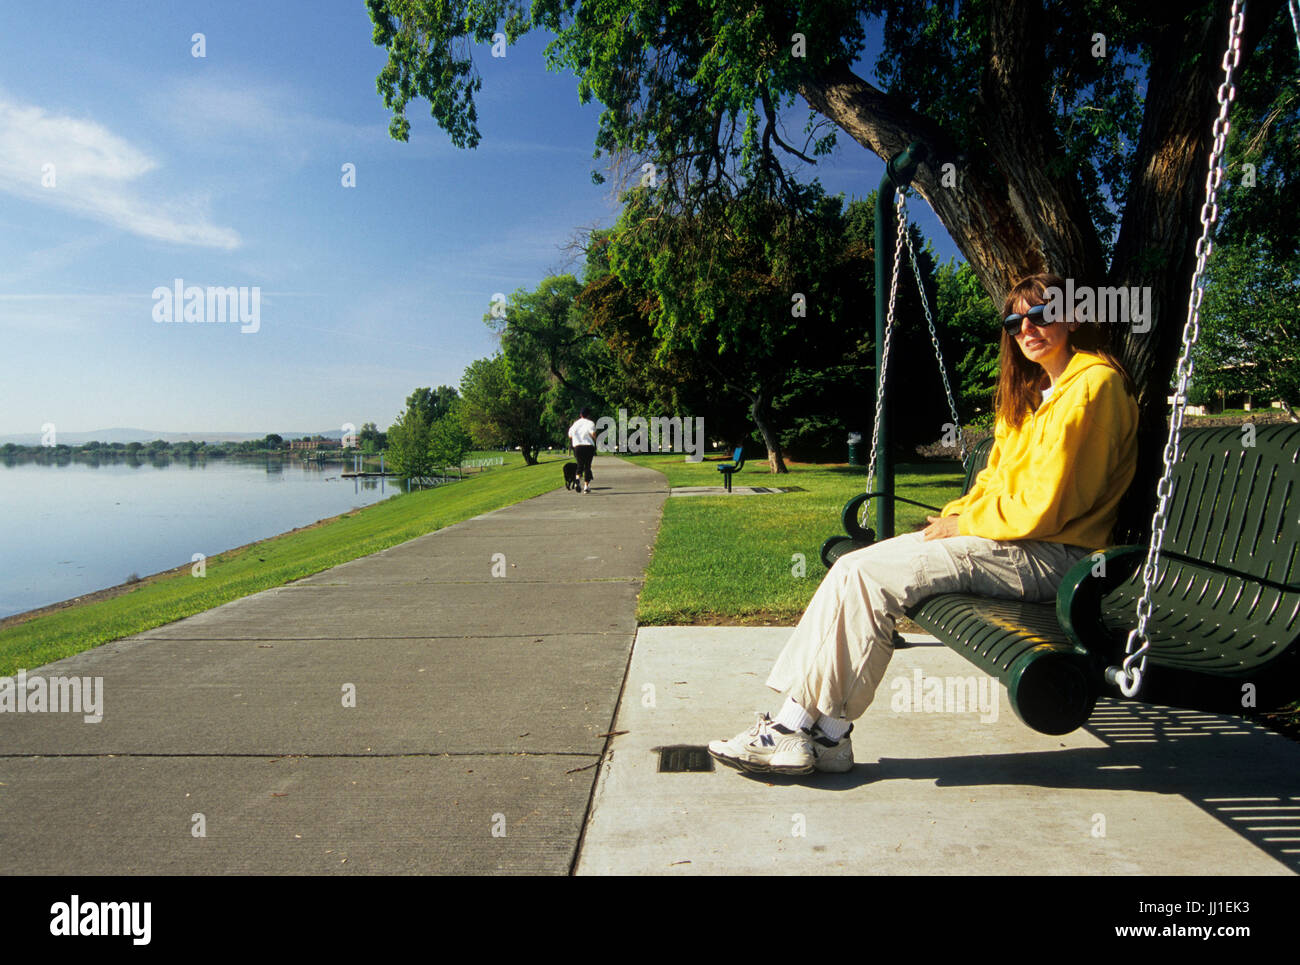 Riverfront Trail with swing, Howard Anon Park, Richland, Washington - Stock Image